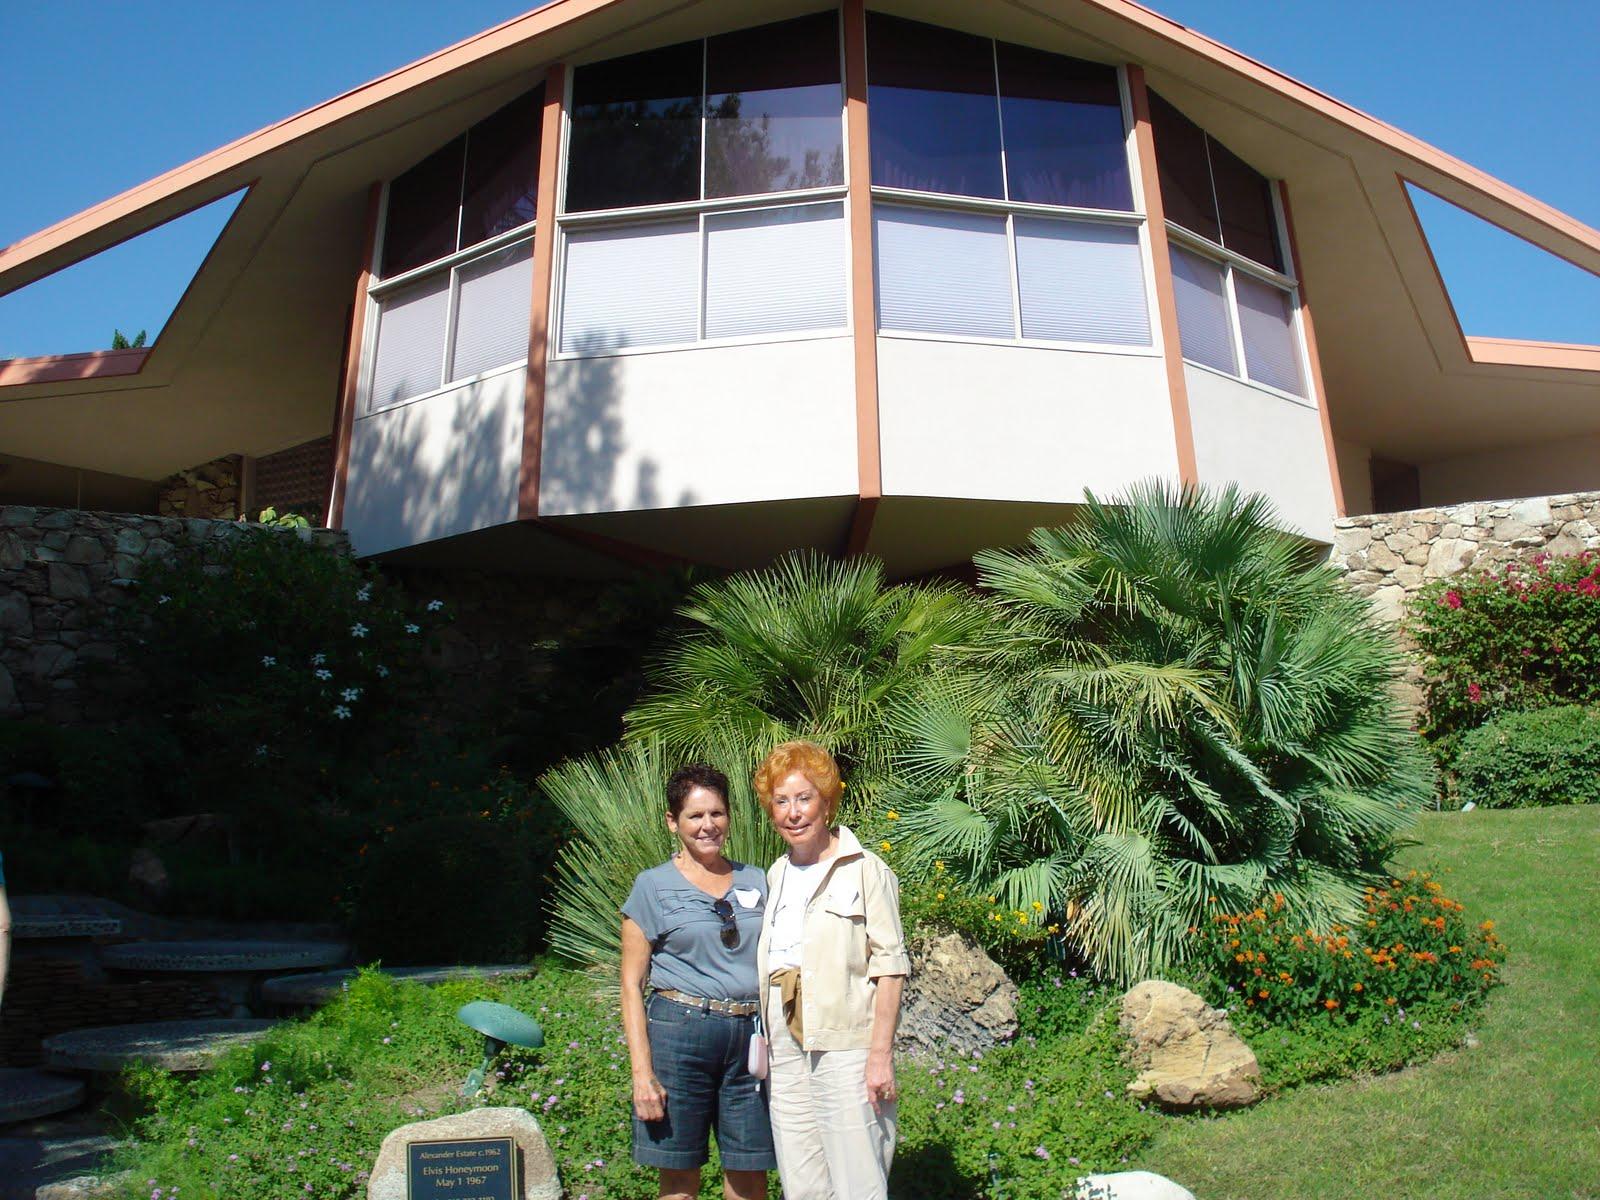 Palm Springs Celebrity Homes Tour